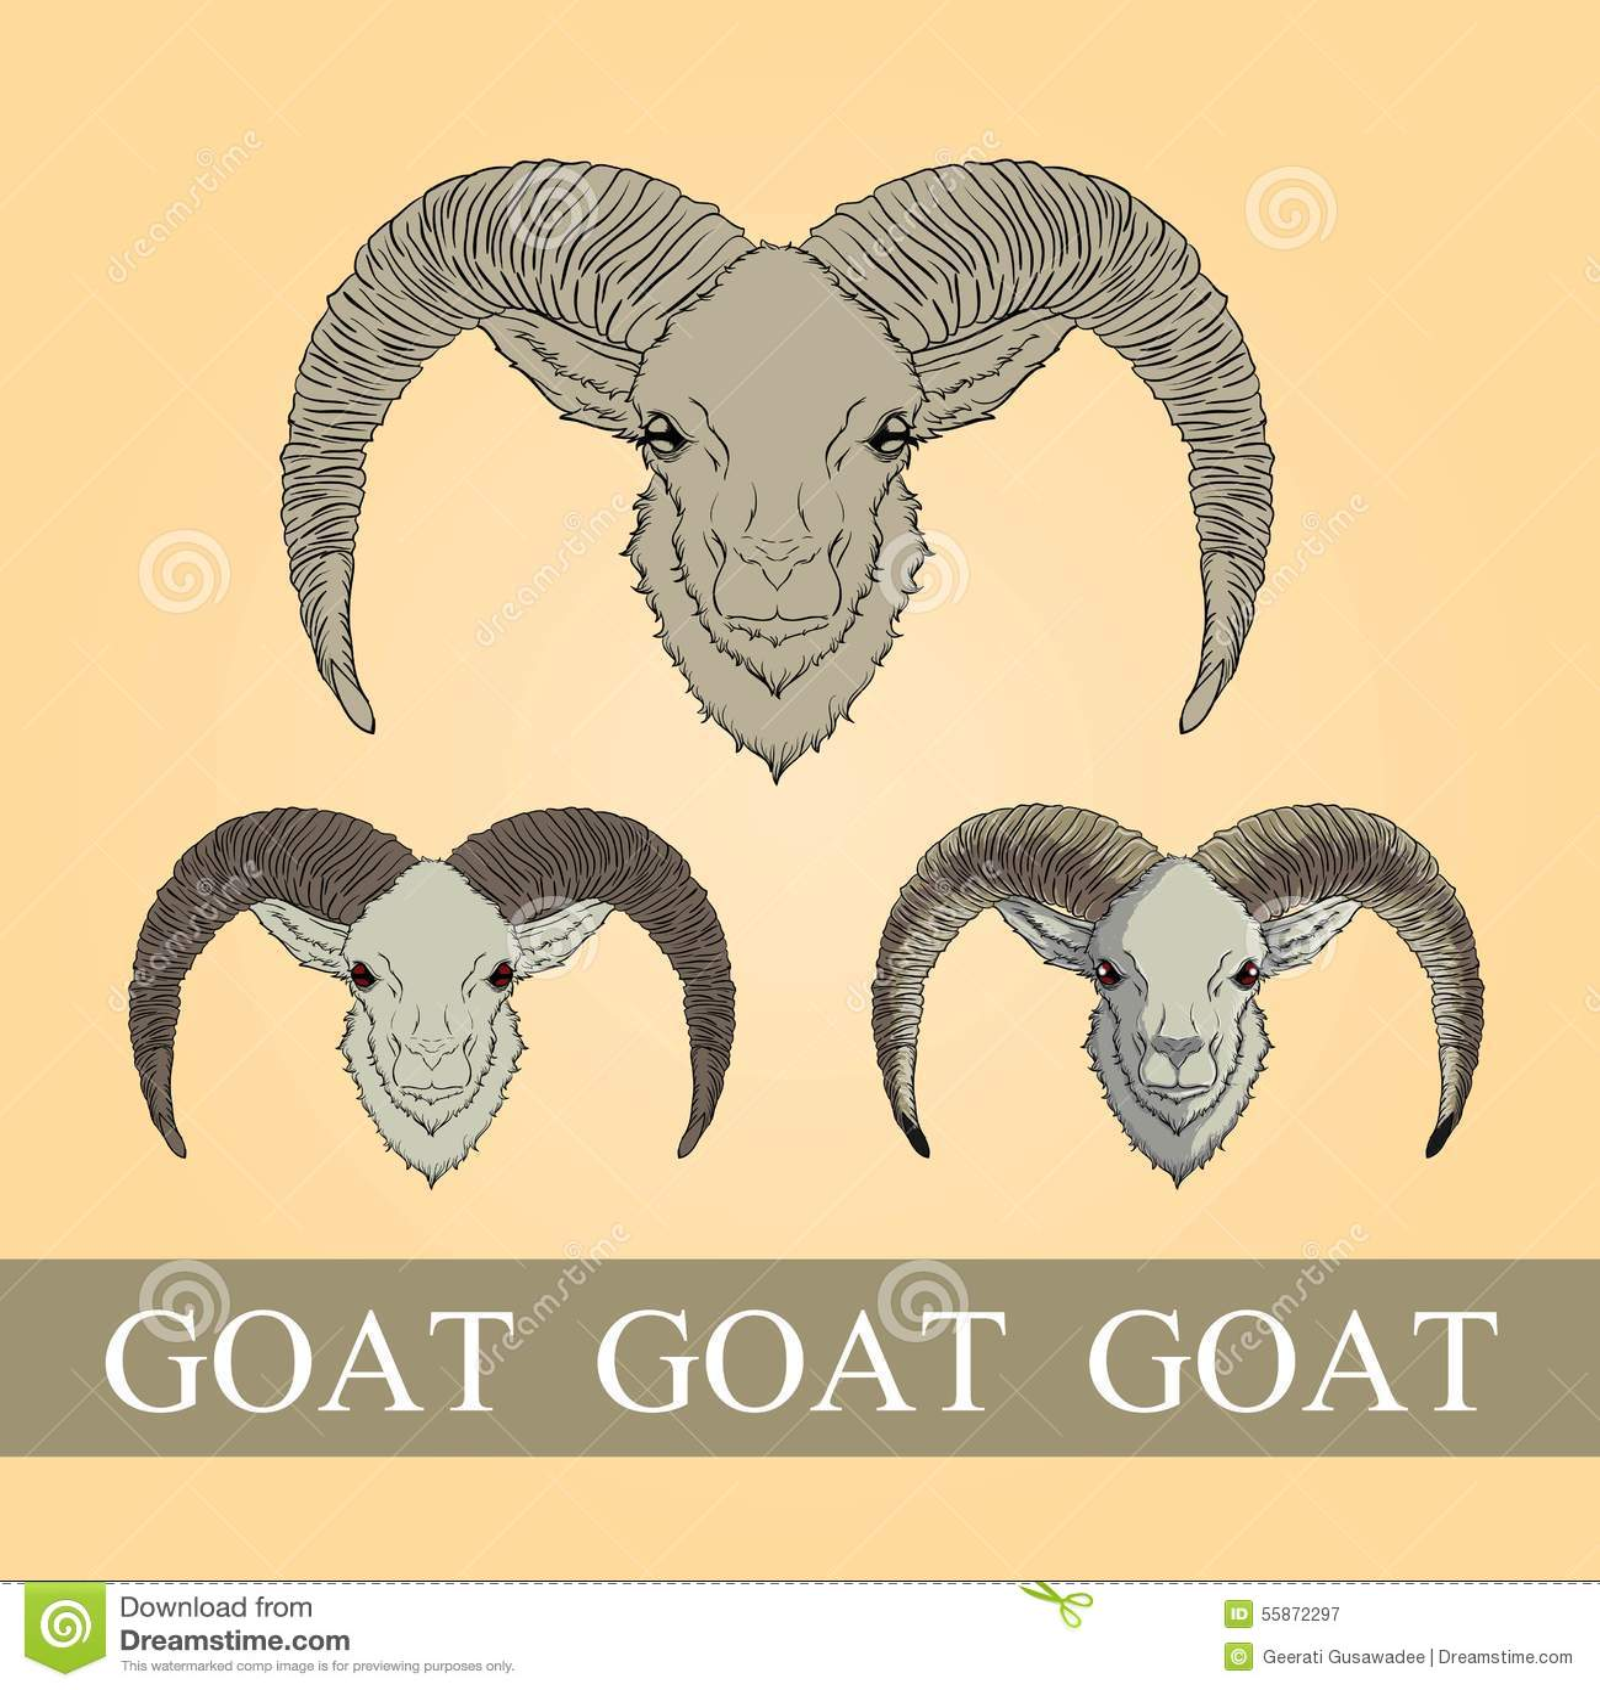 Goat Stock Vector - Image: 55872297